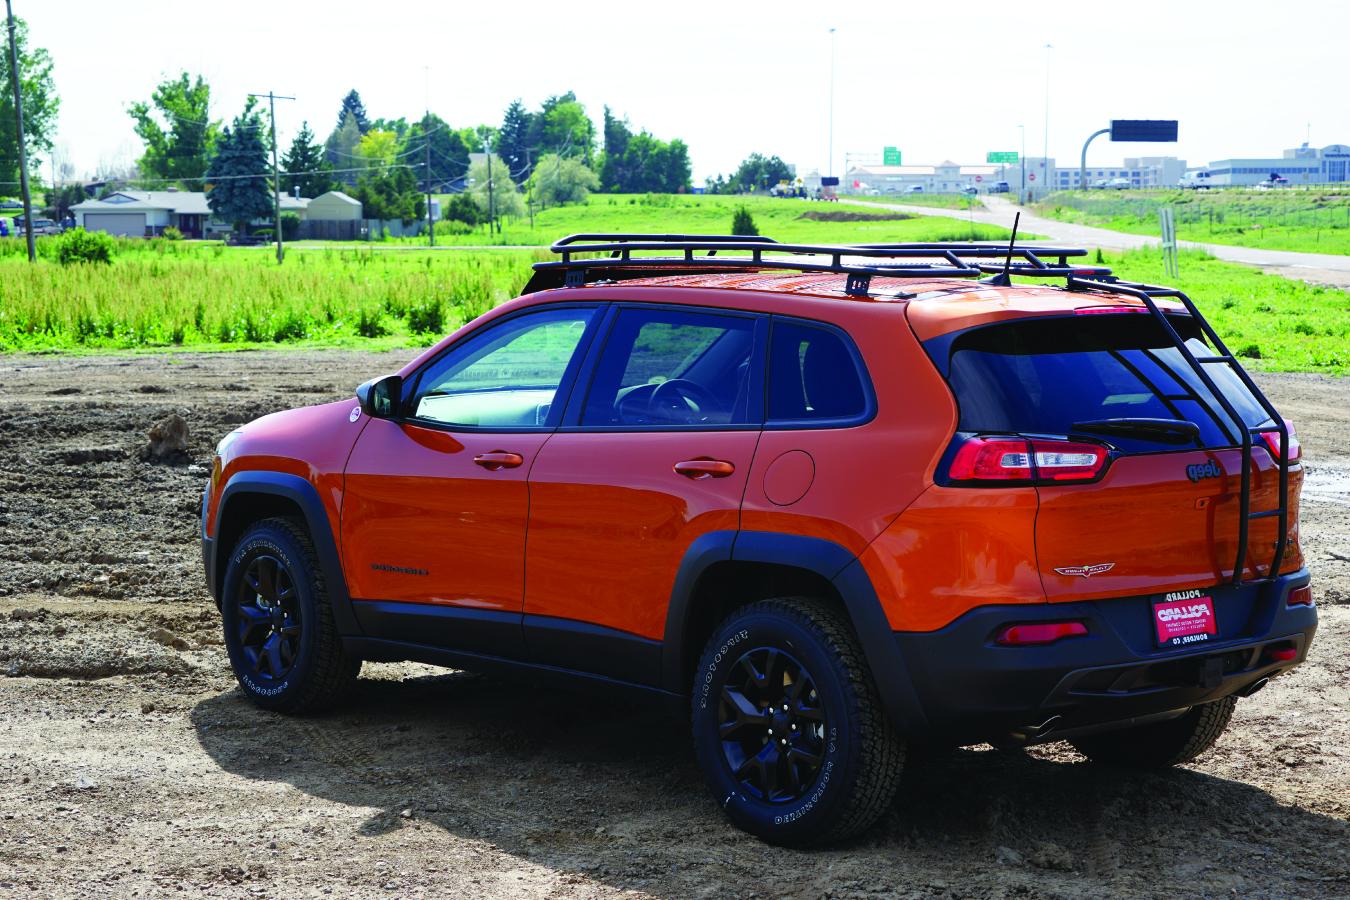 gobi-roof-racks-jeep-cherokee-kl-stealth-rack-rear-ladder-low - Gobi Racks